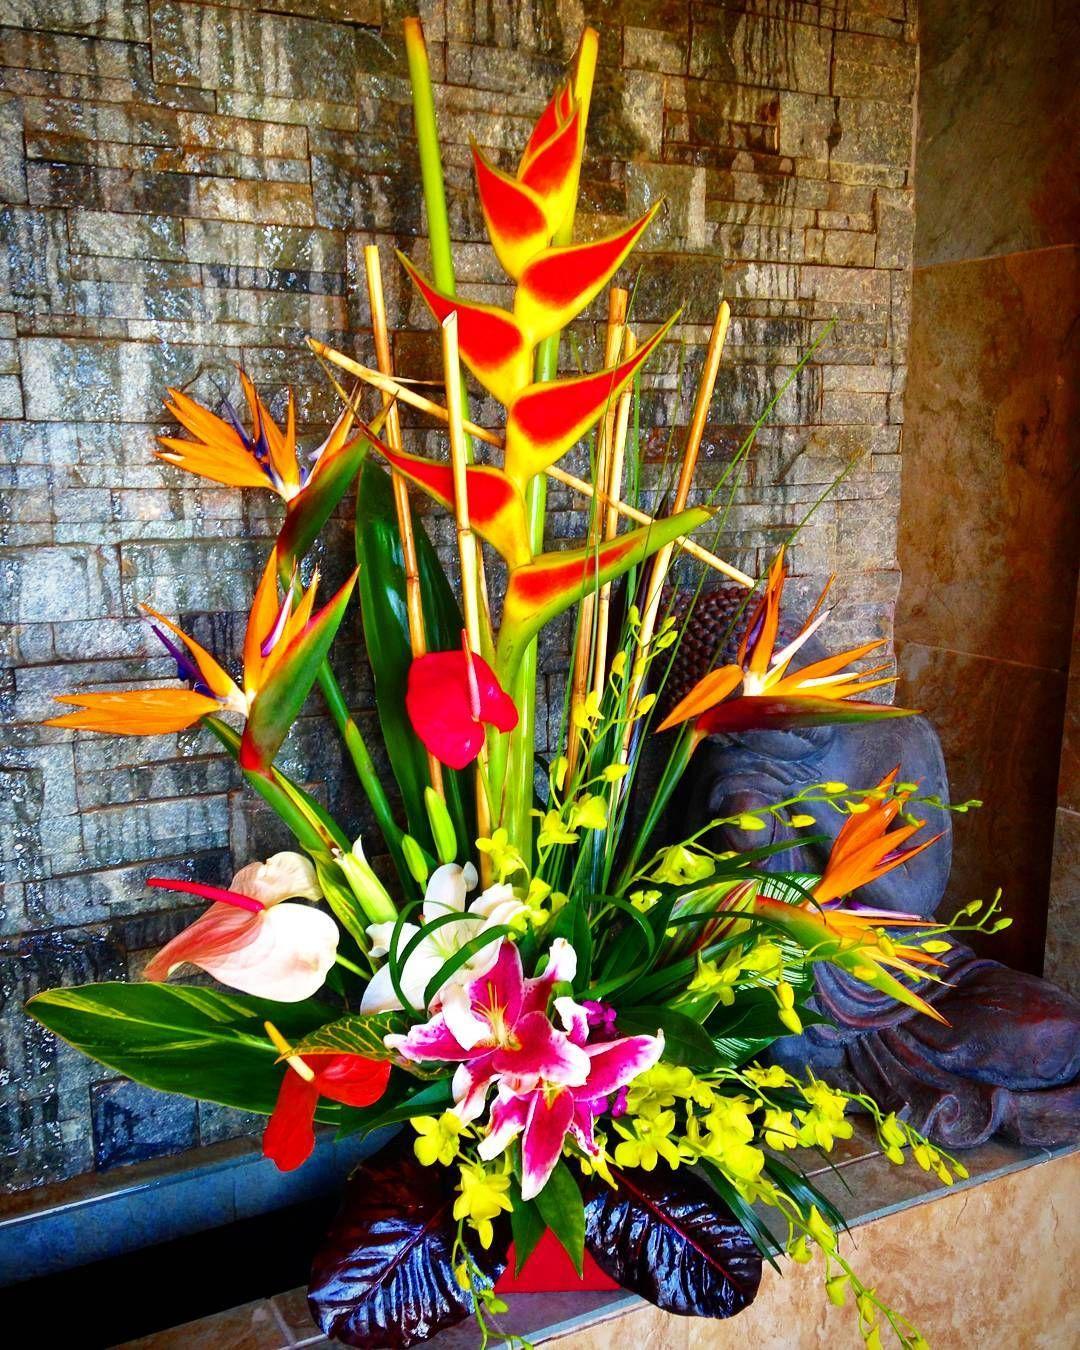 @bellaflorihouston 713-529-2233  #flowers #tulips #tulip #houston #houstontx #sanvalentin #valentine #mibellaflori #BellaFlori #bellaflorihouston #valentineday #love #lettheflowersdothetalking  by bellaflorihouston